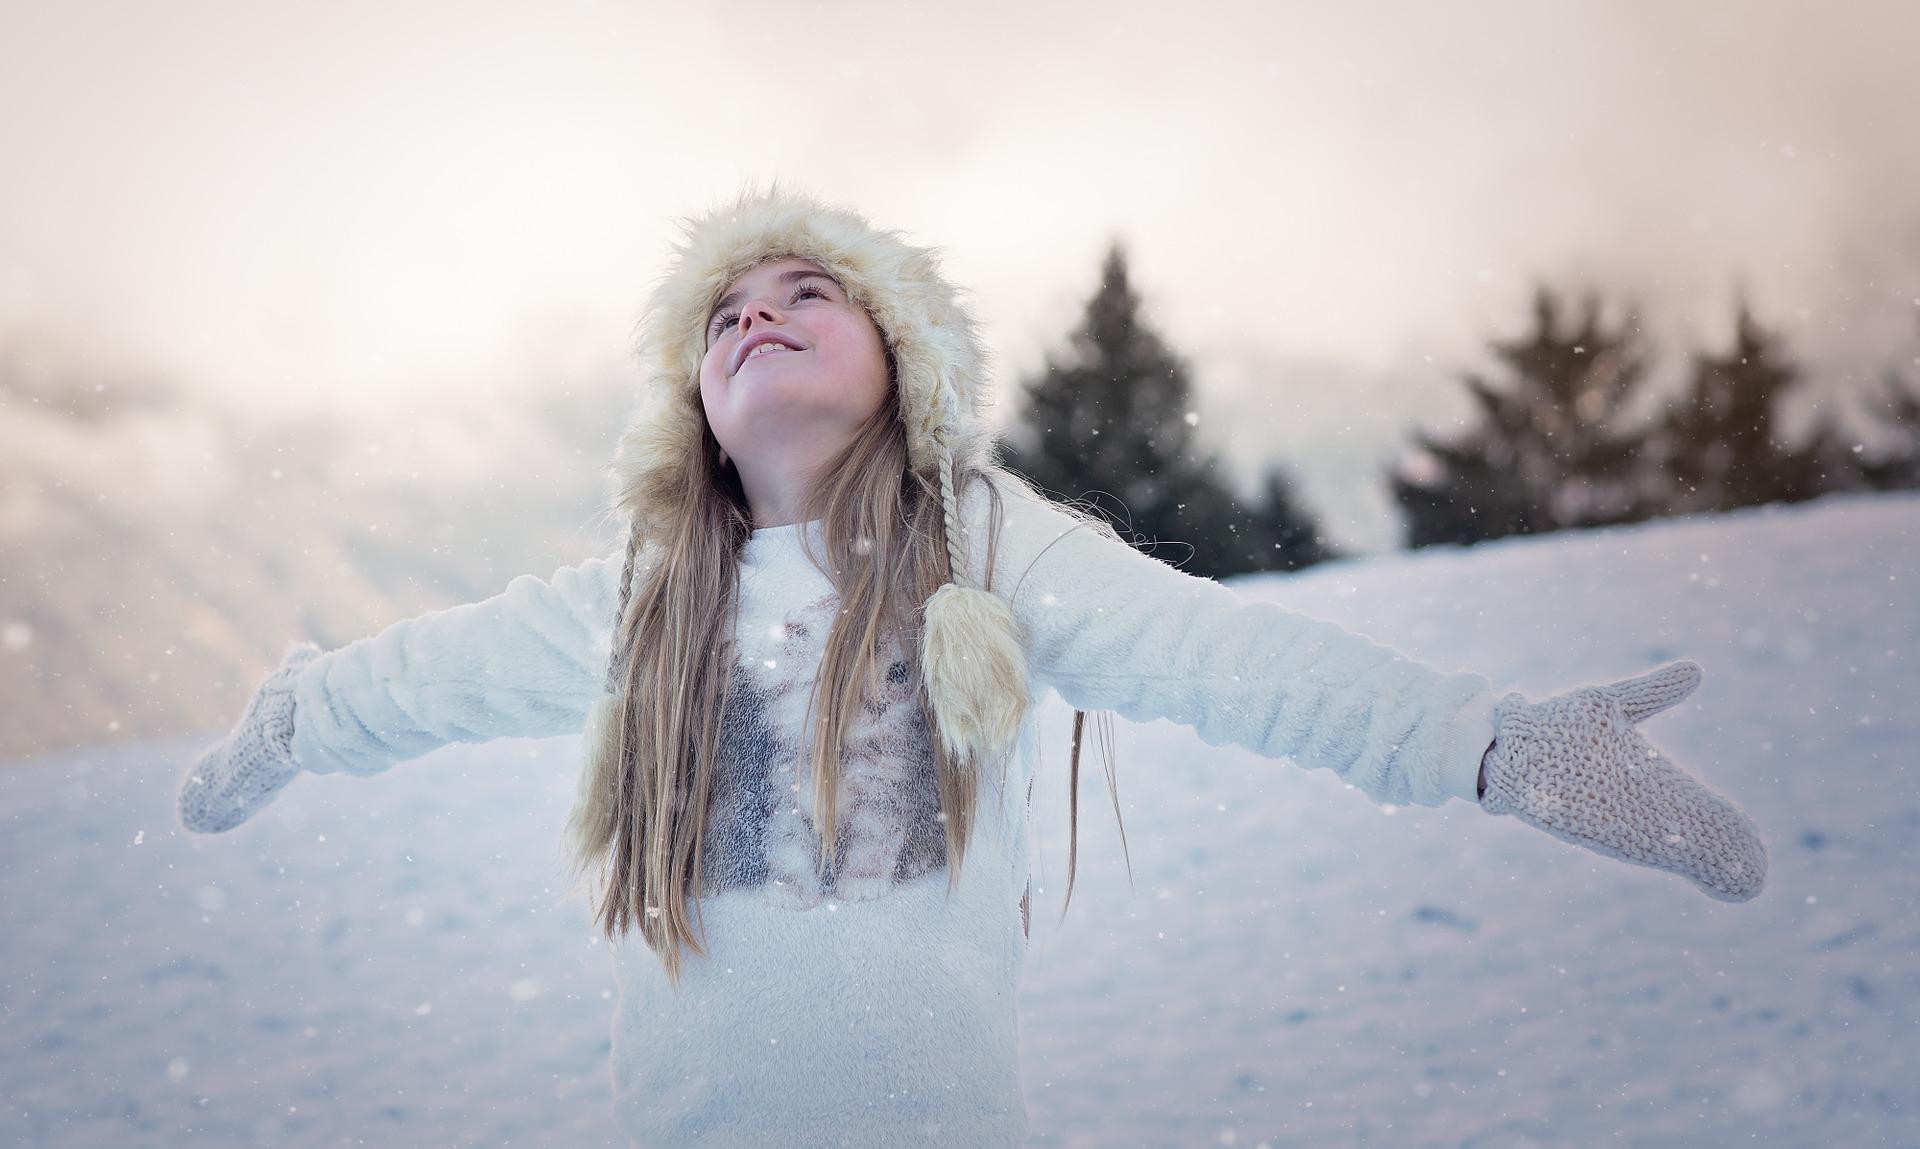 The ultimate winter getaway checklist